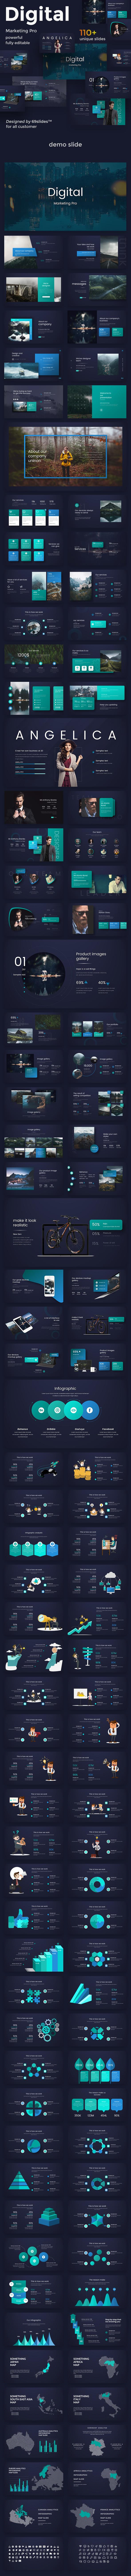 Digital Marketing Pro Design Powerpoint Template - Creative PowerPoint Templates